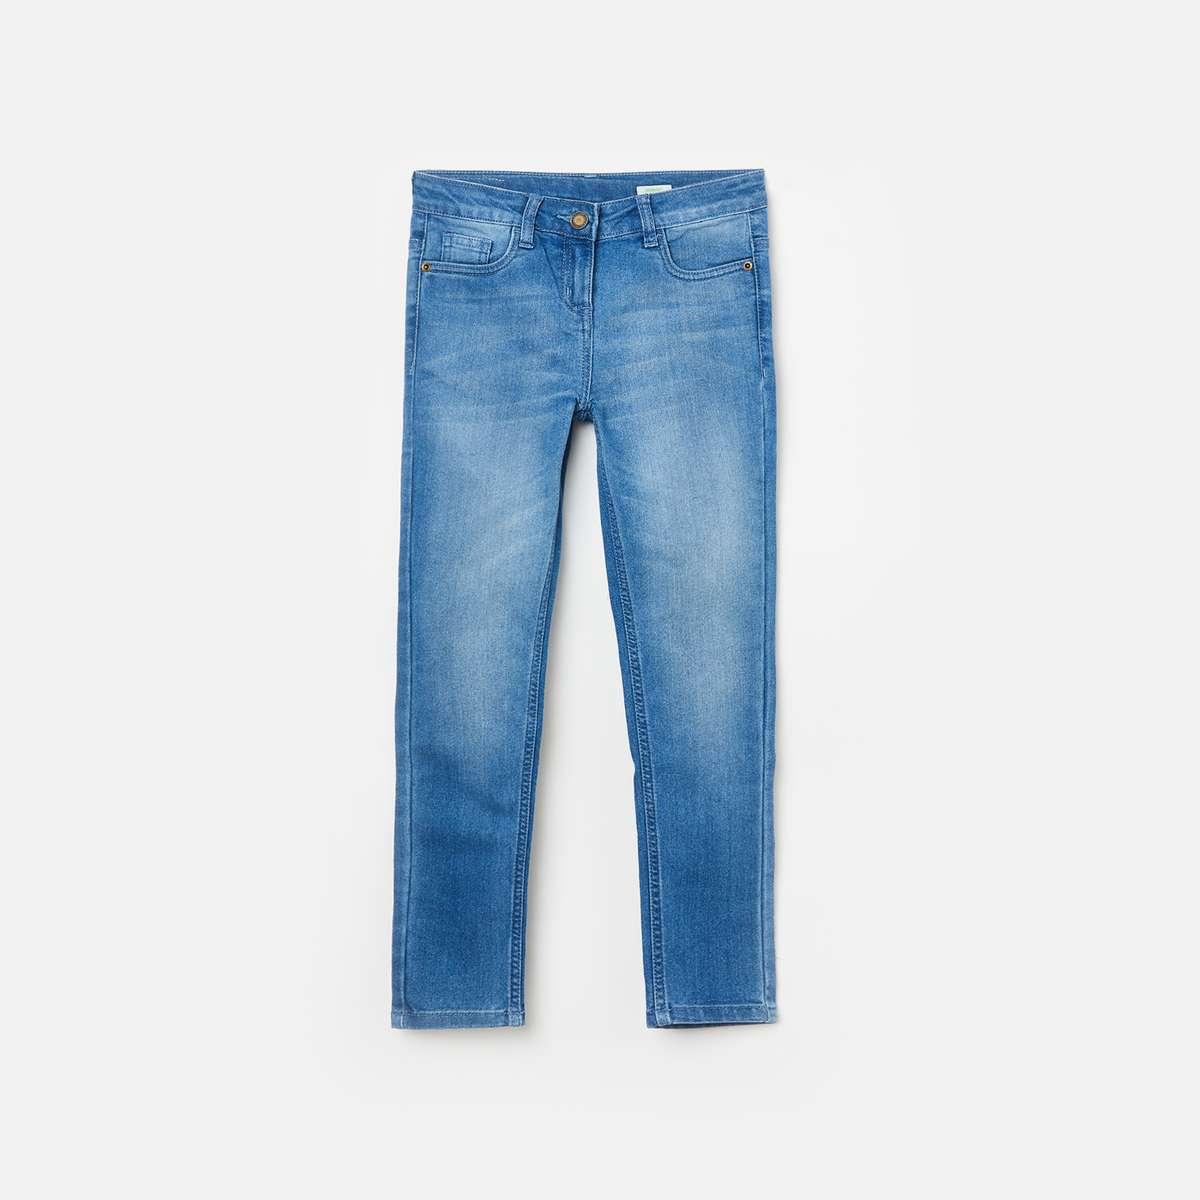 2.BOSSINI Girls Stonewashed Regular Fit Jeans